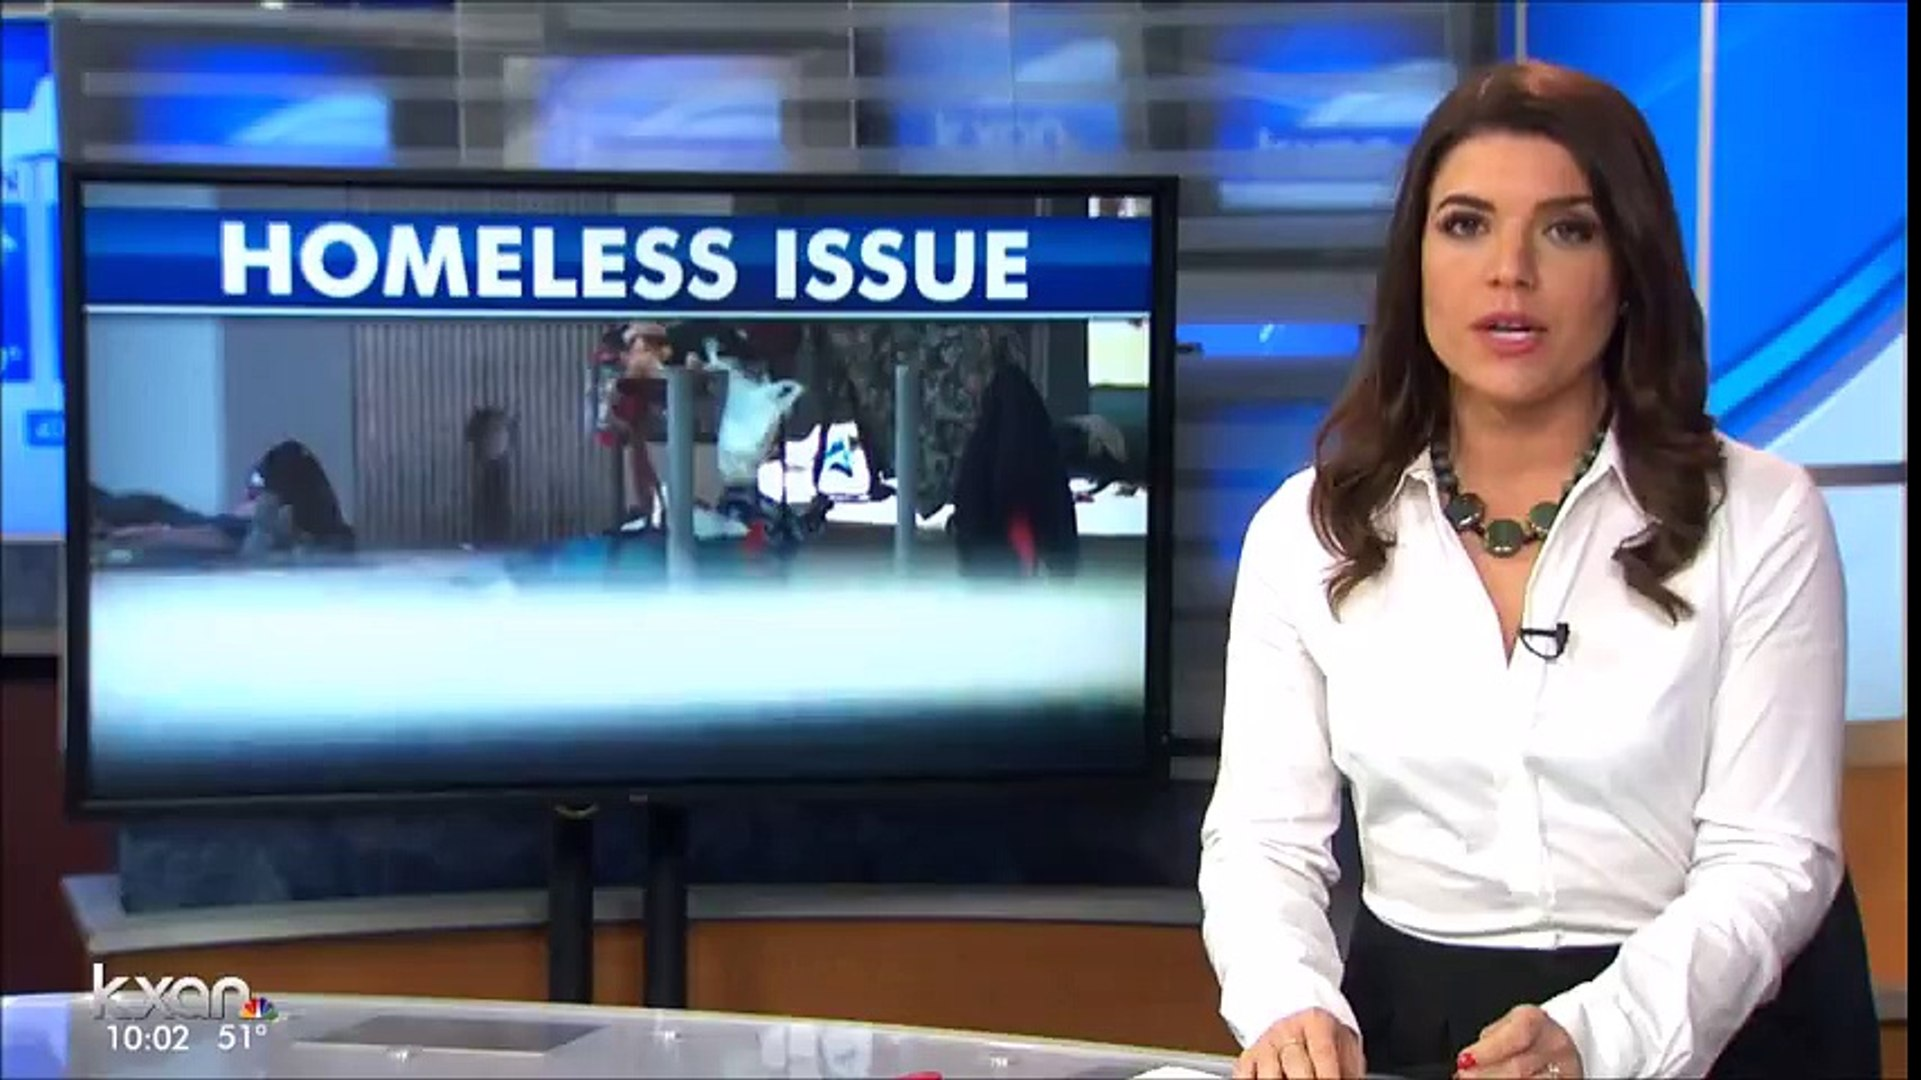 Vic's Non-Profit Homeless Center